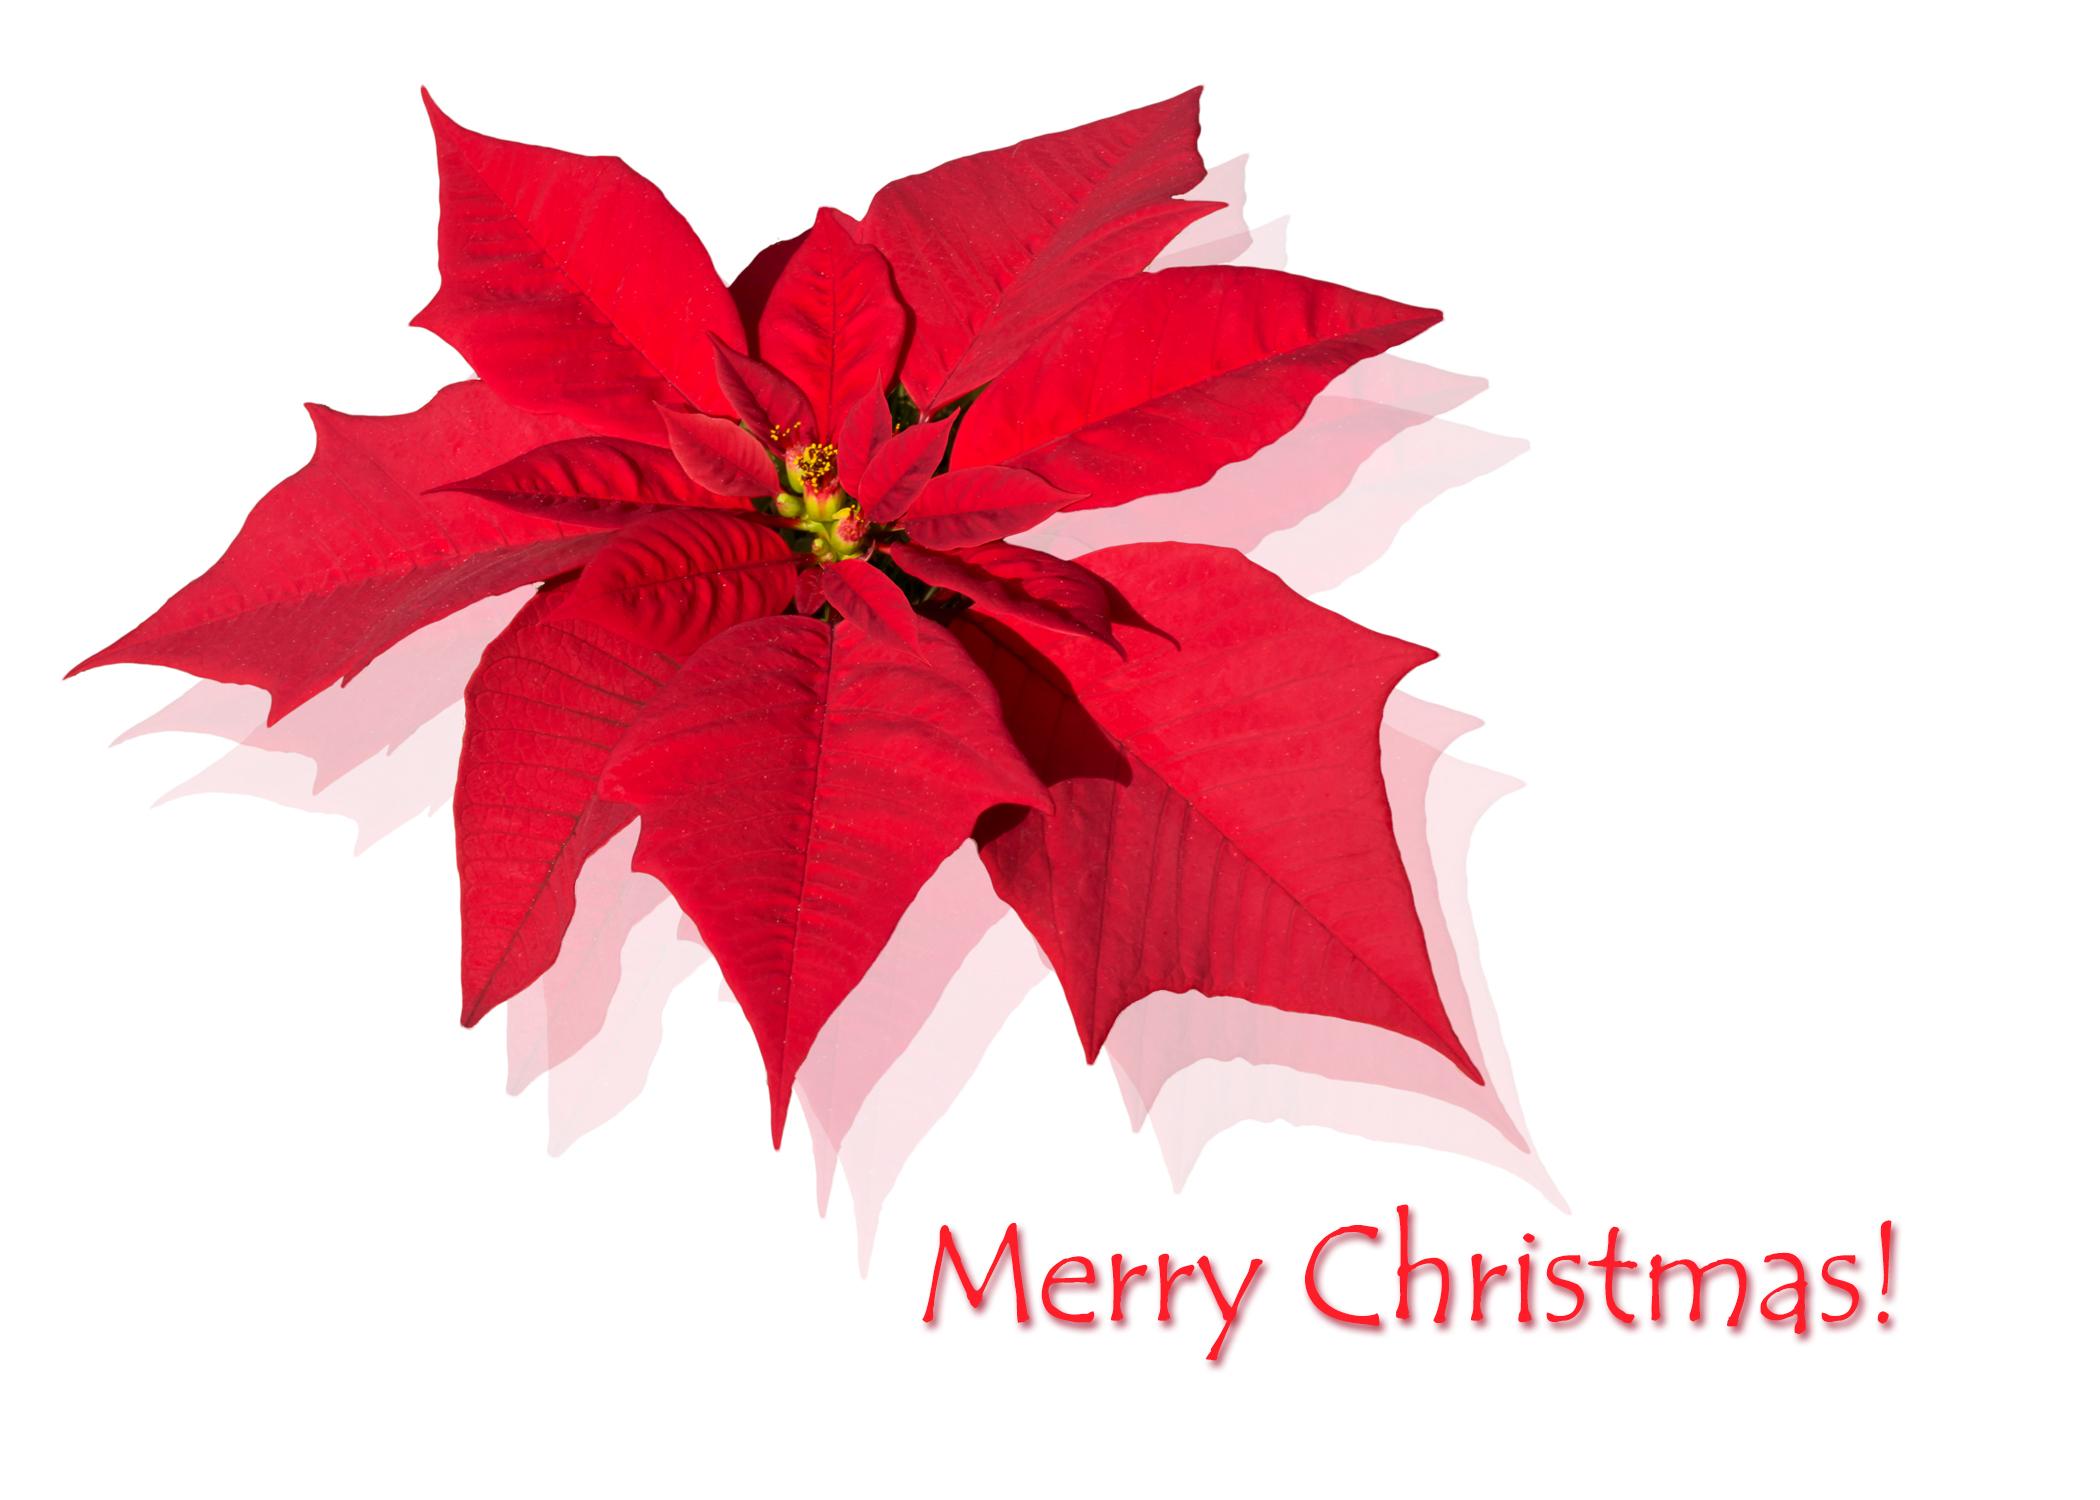 MerryChristmas_poinsettia.jpg